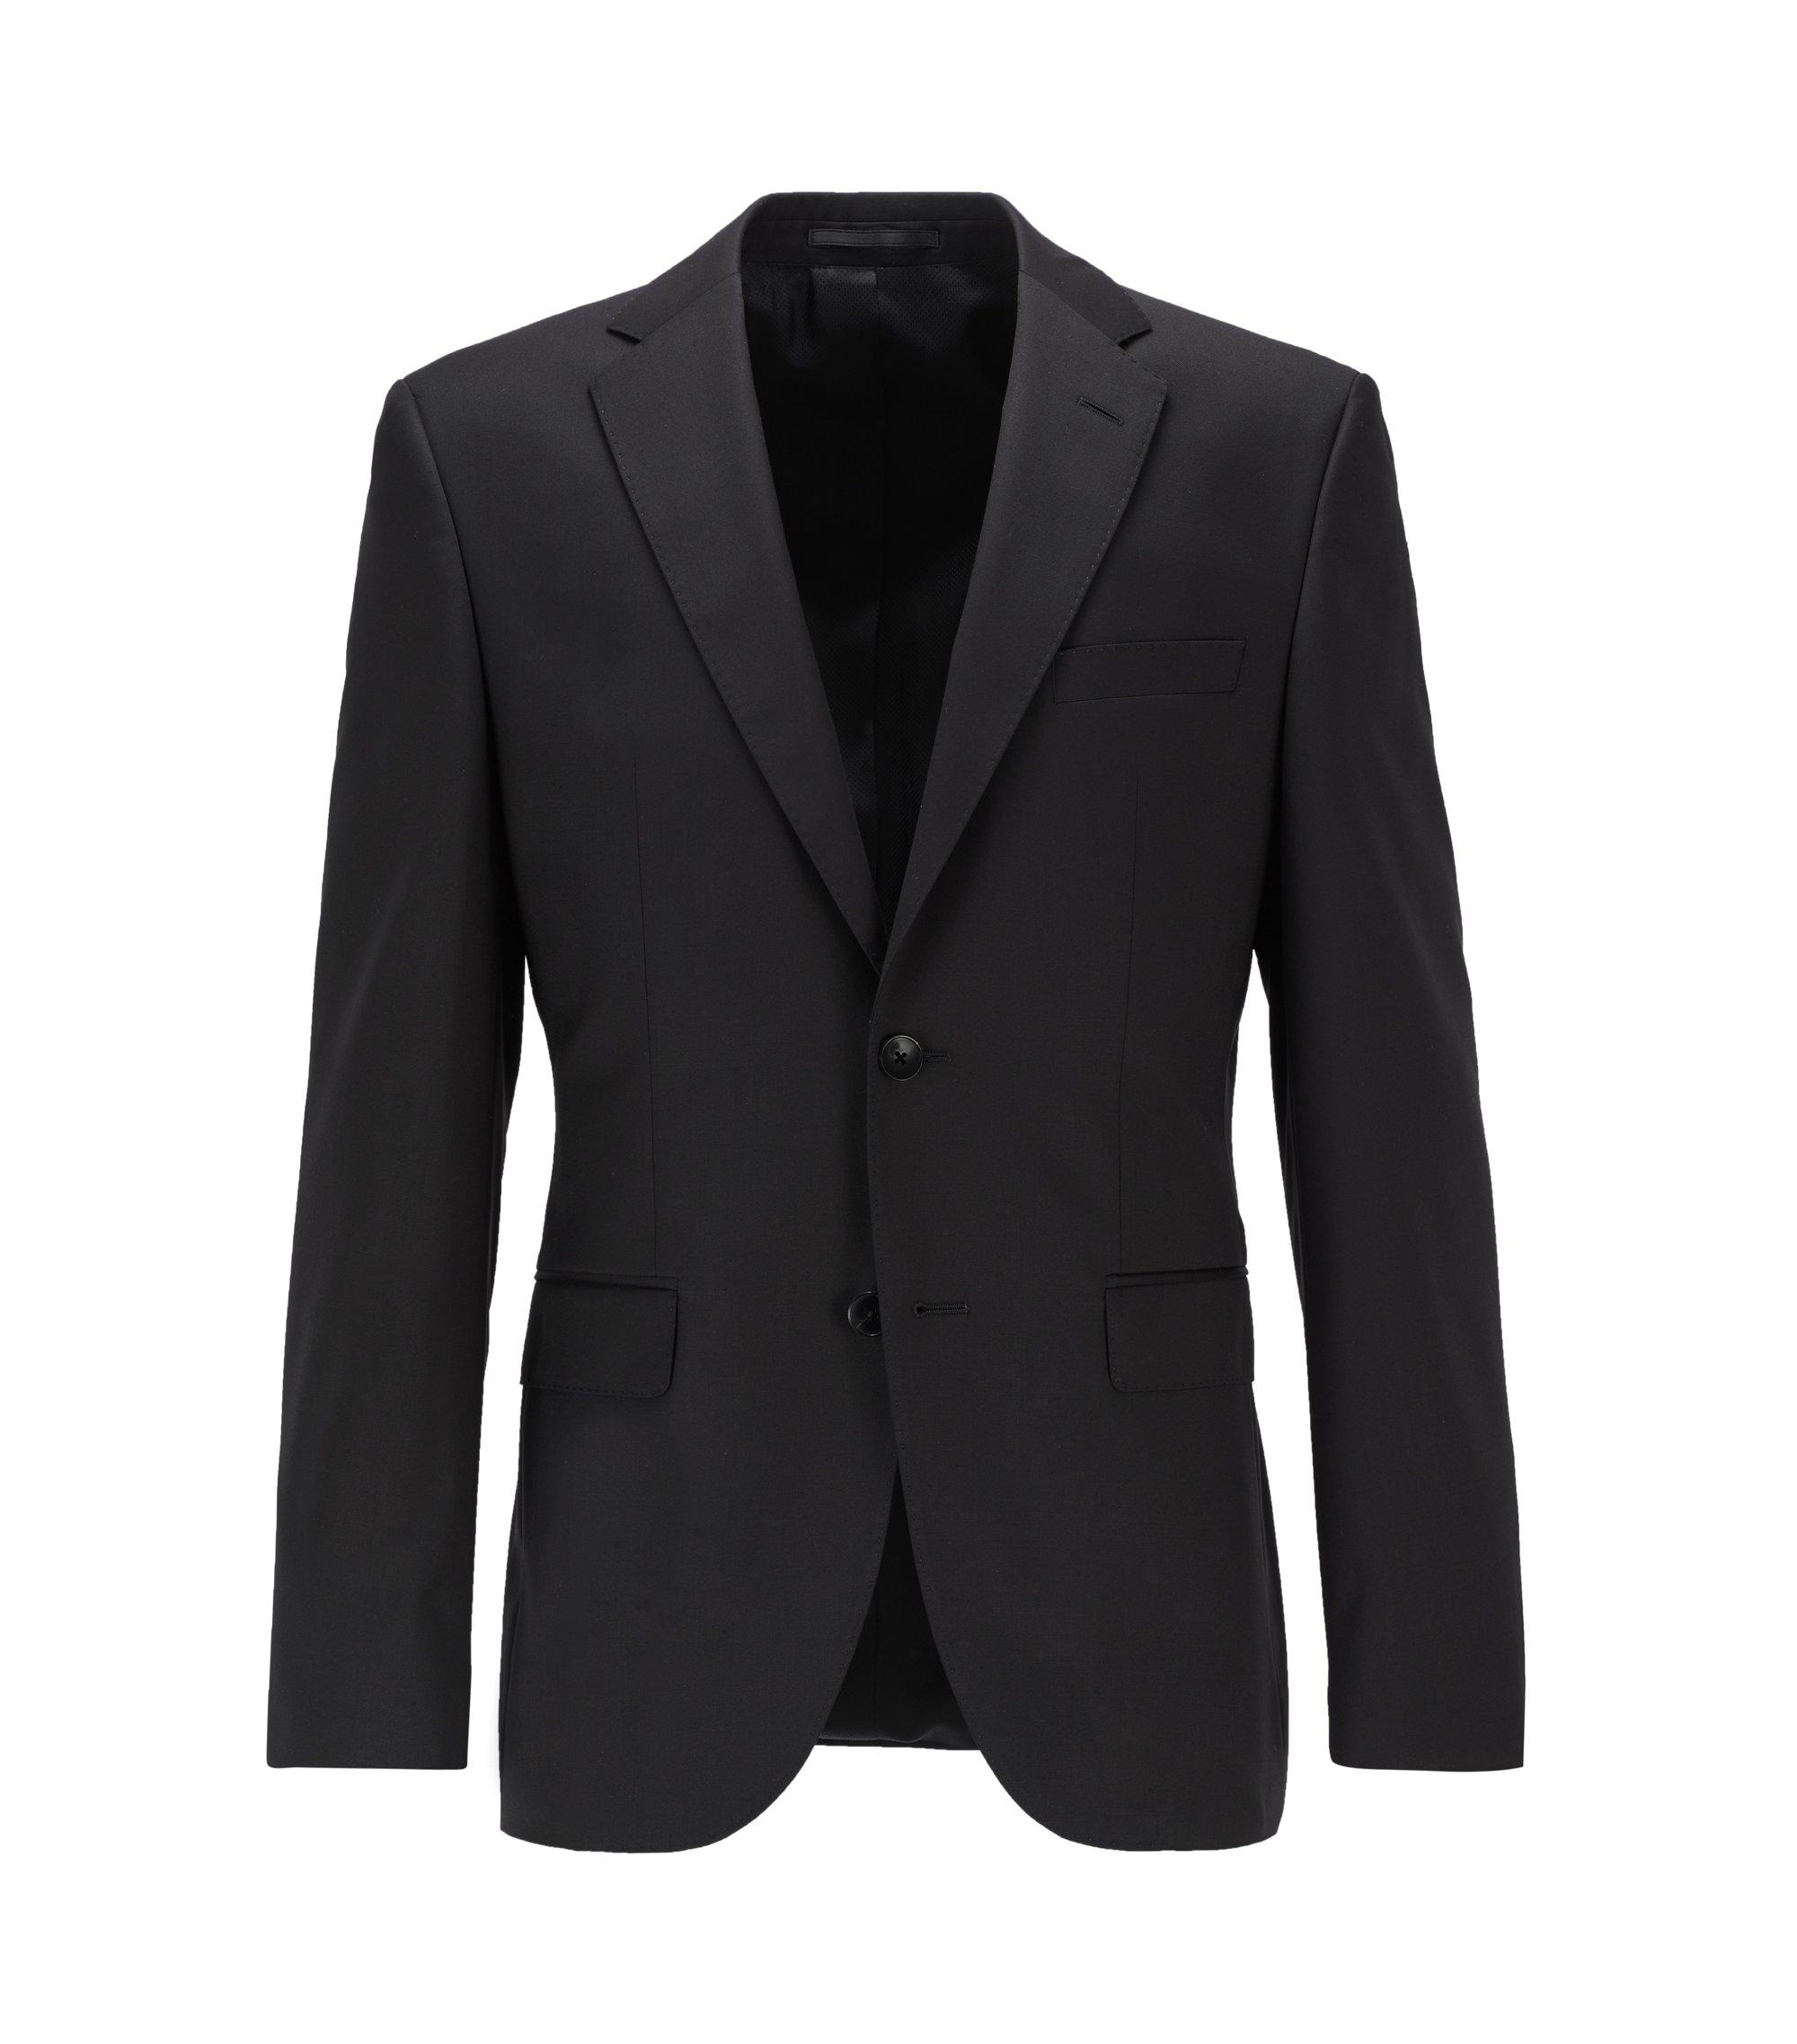 Giacca regular fit in lana vergine con cuciture AMF, Nero